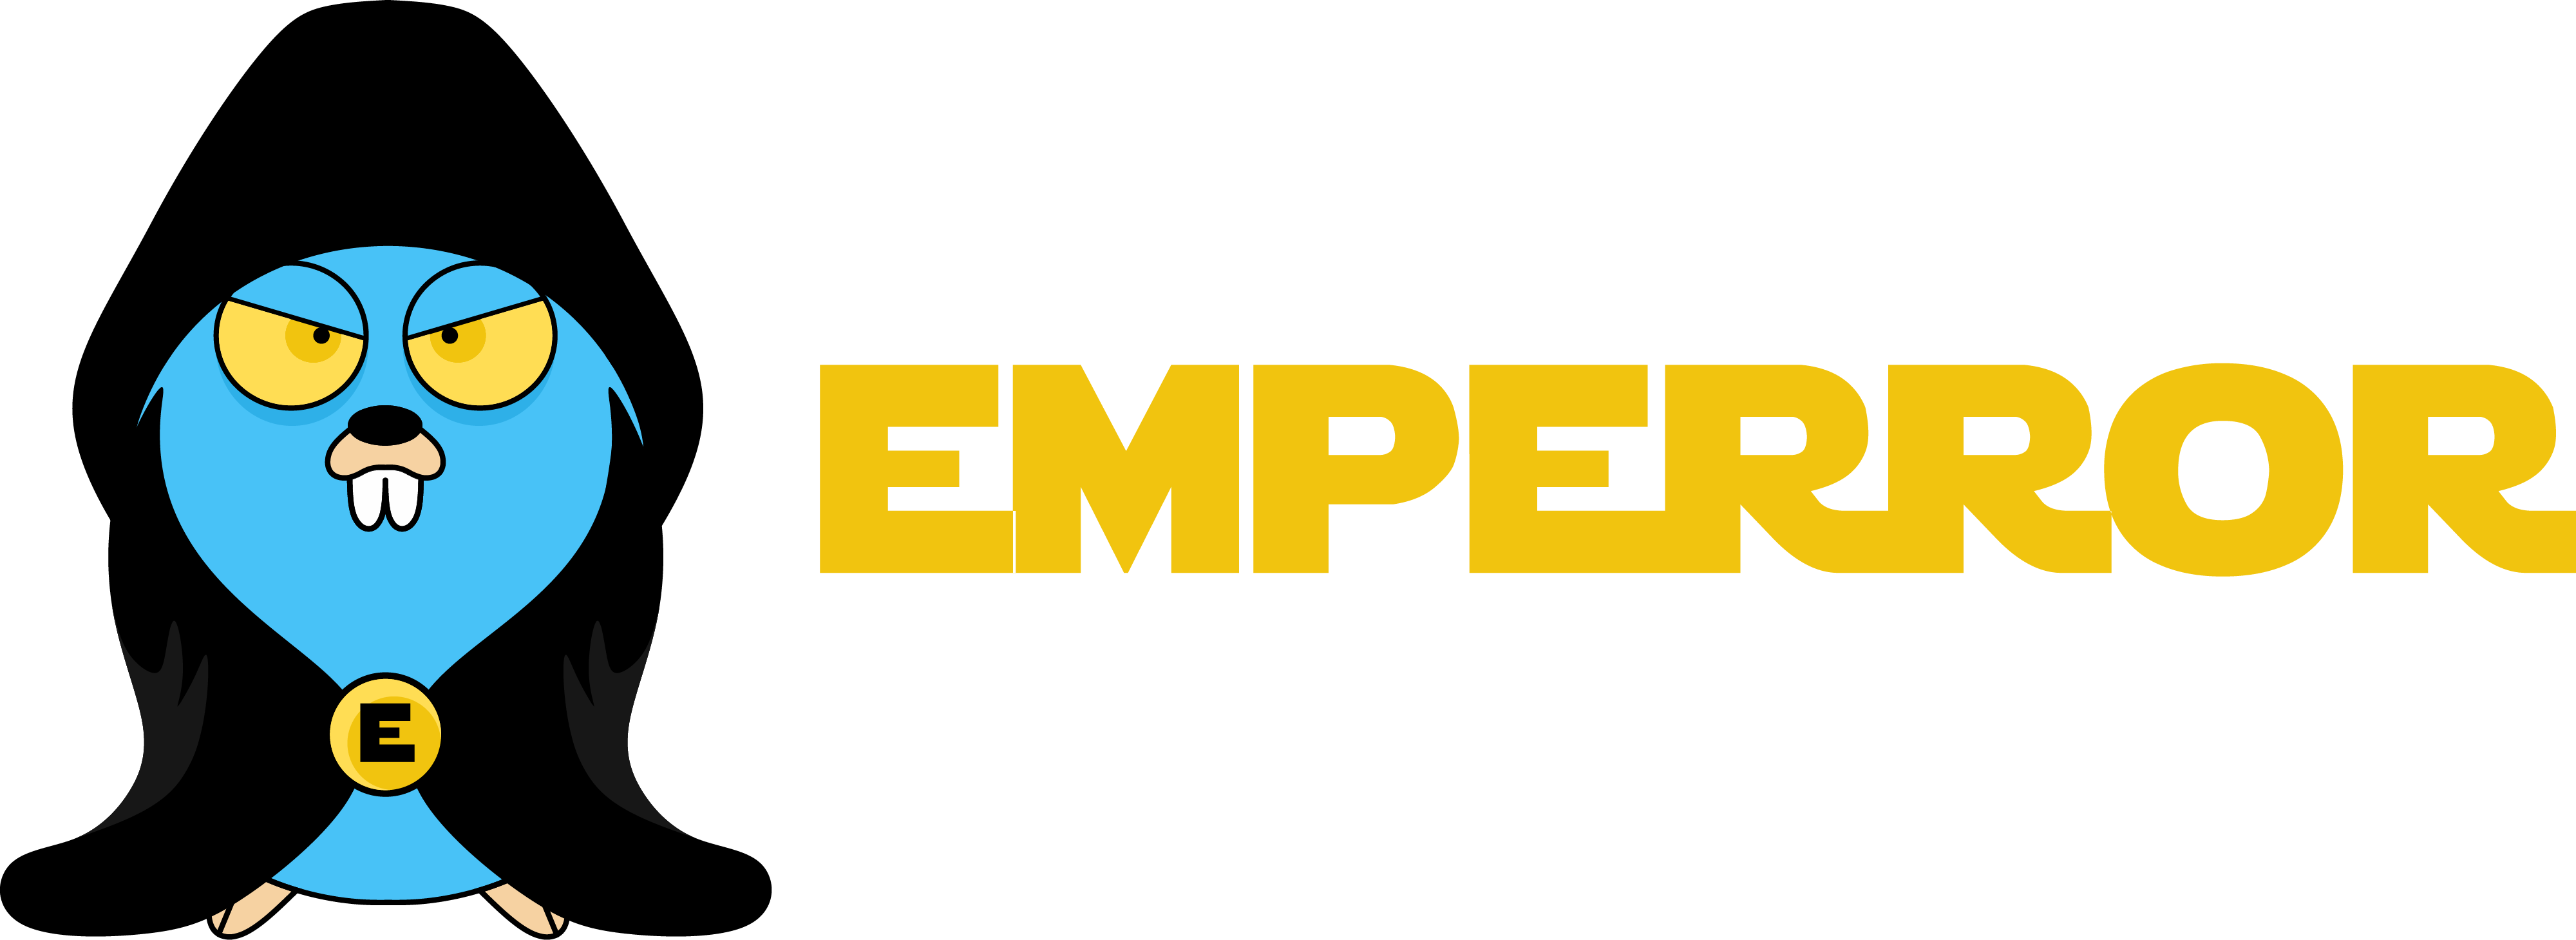 Emperror